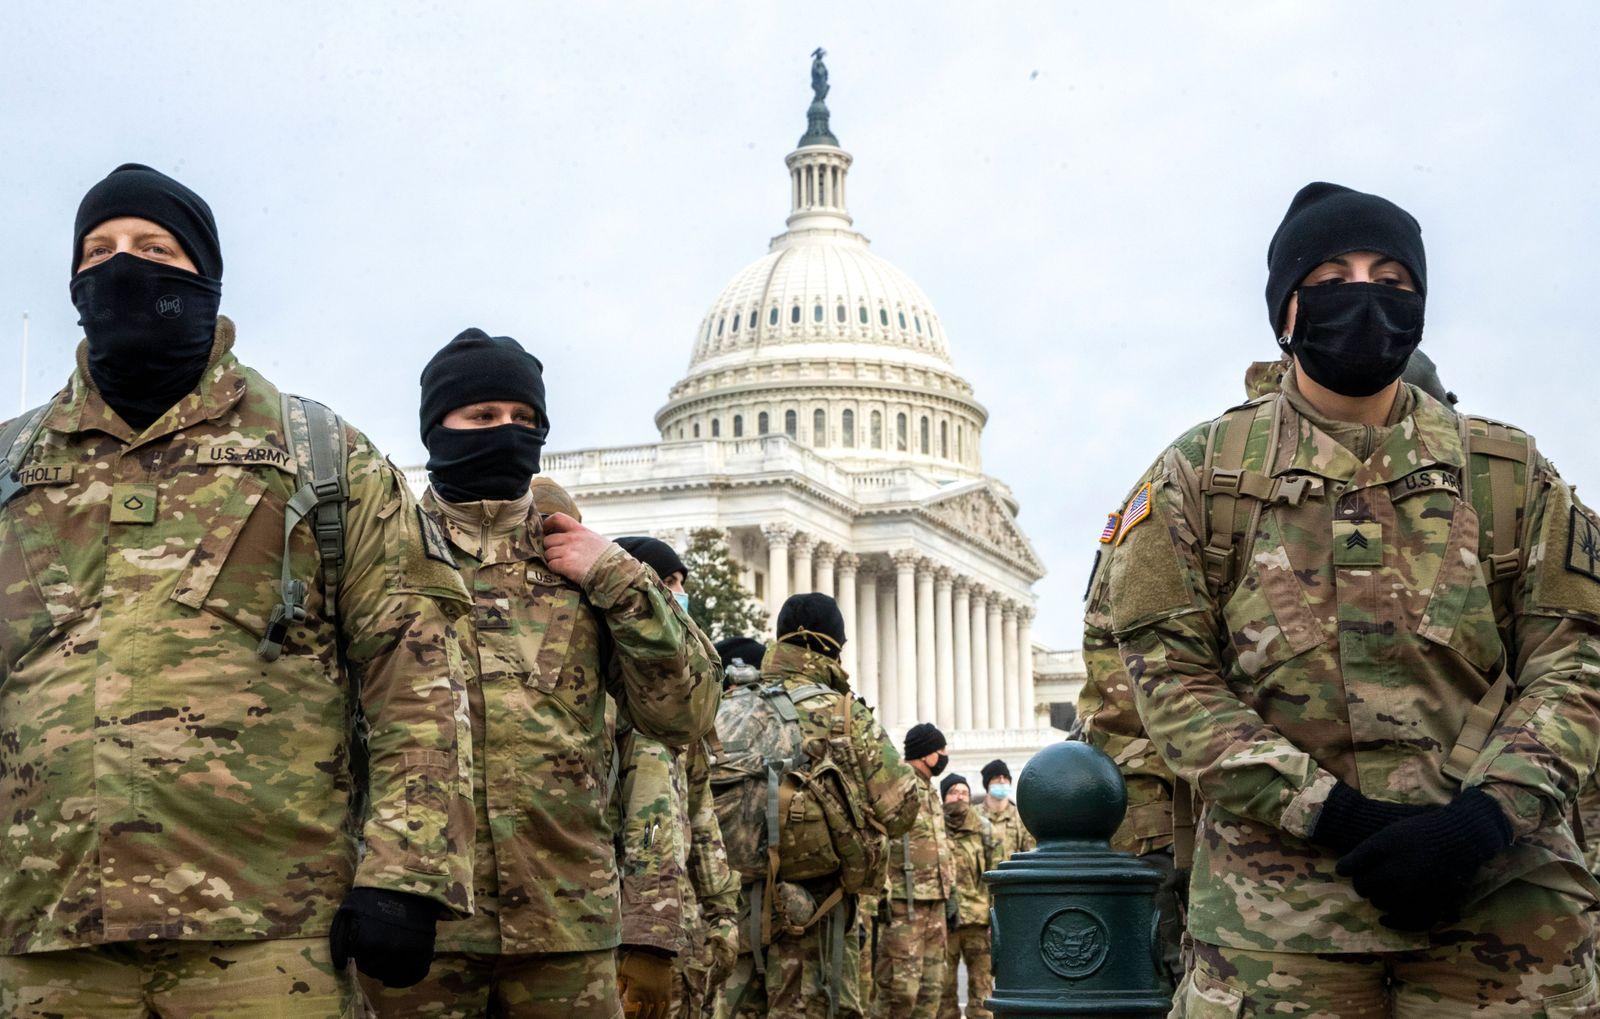 US Capitol Secutiry, Washington, USA - 11 Jan 2021